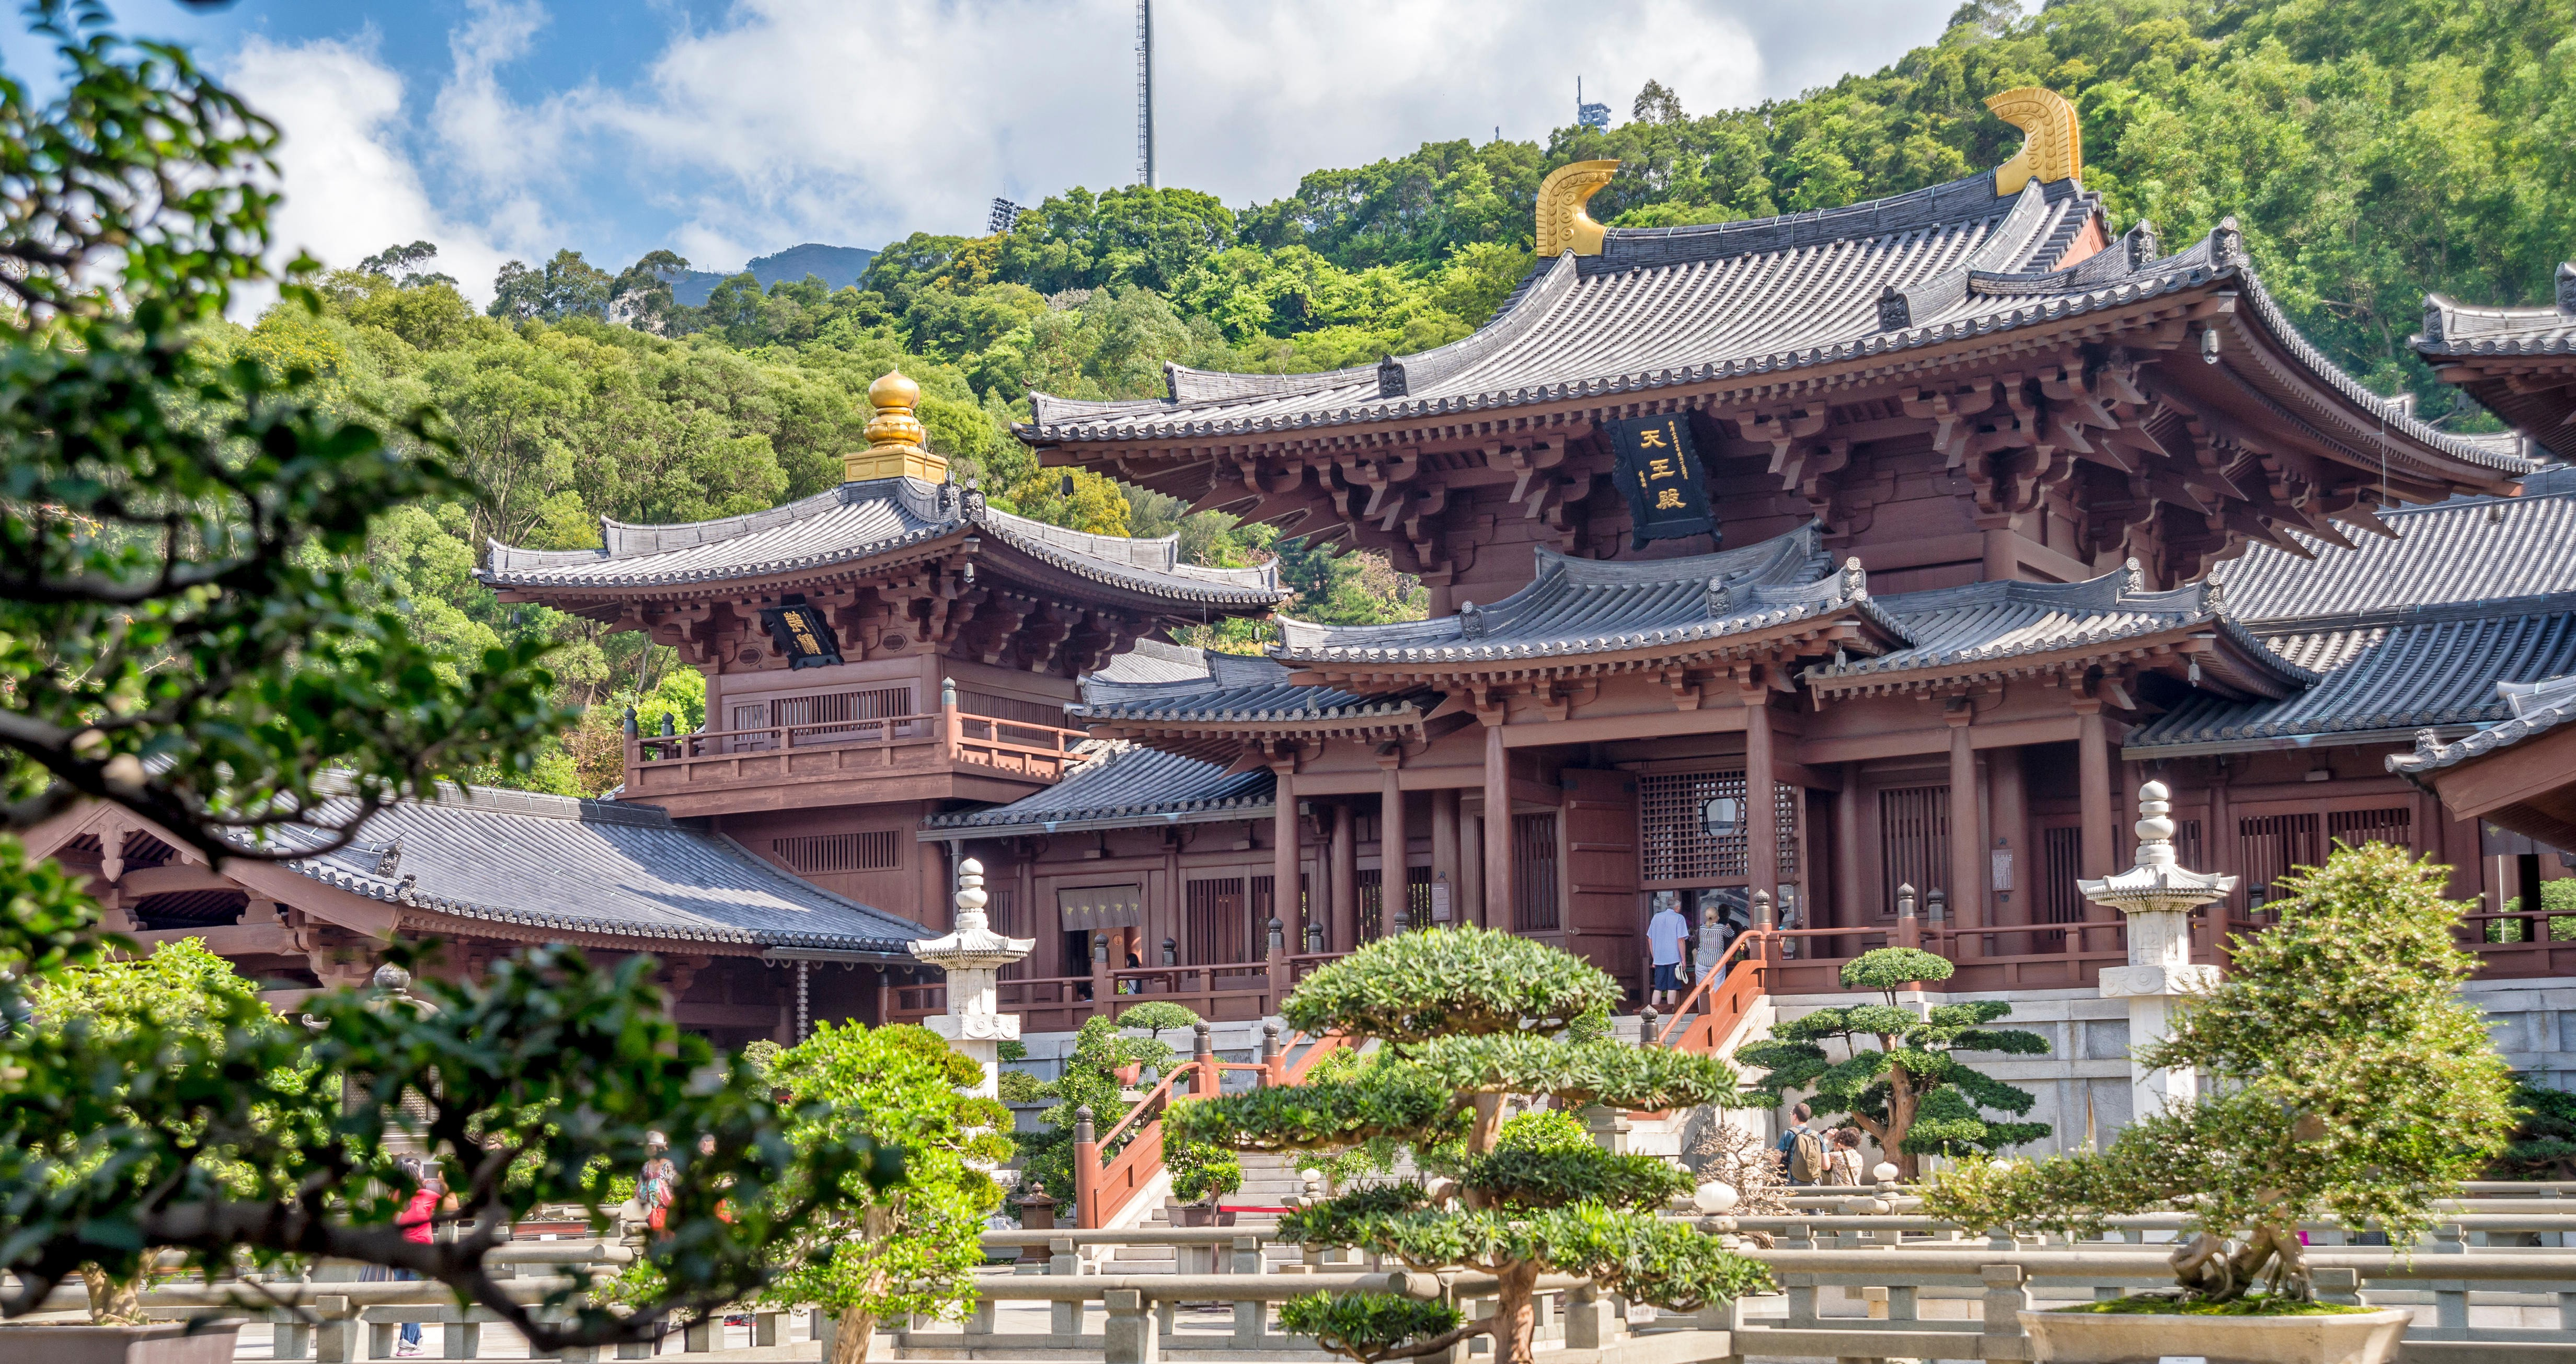 The 15 Best Vegetarian and Vegan Restaurants in Hong Kong